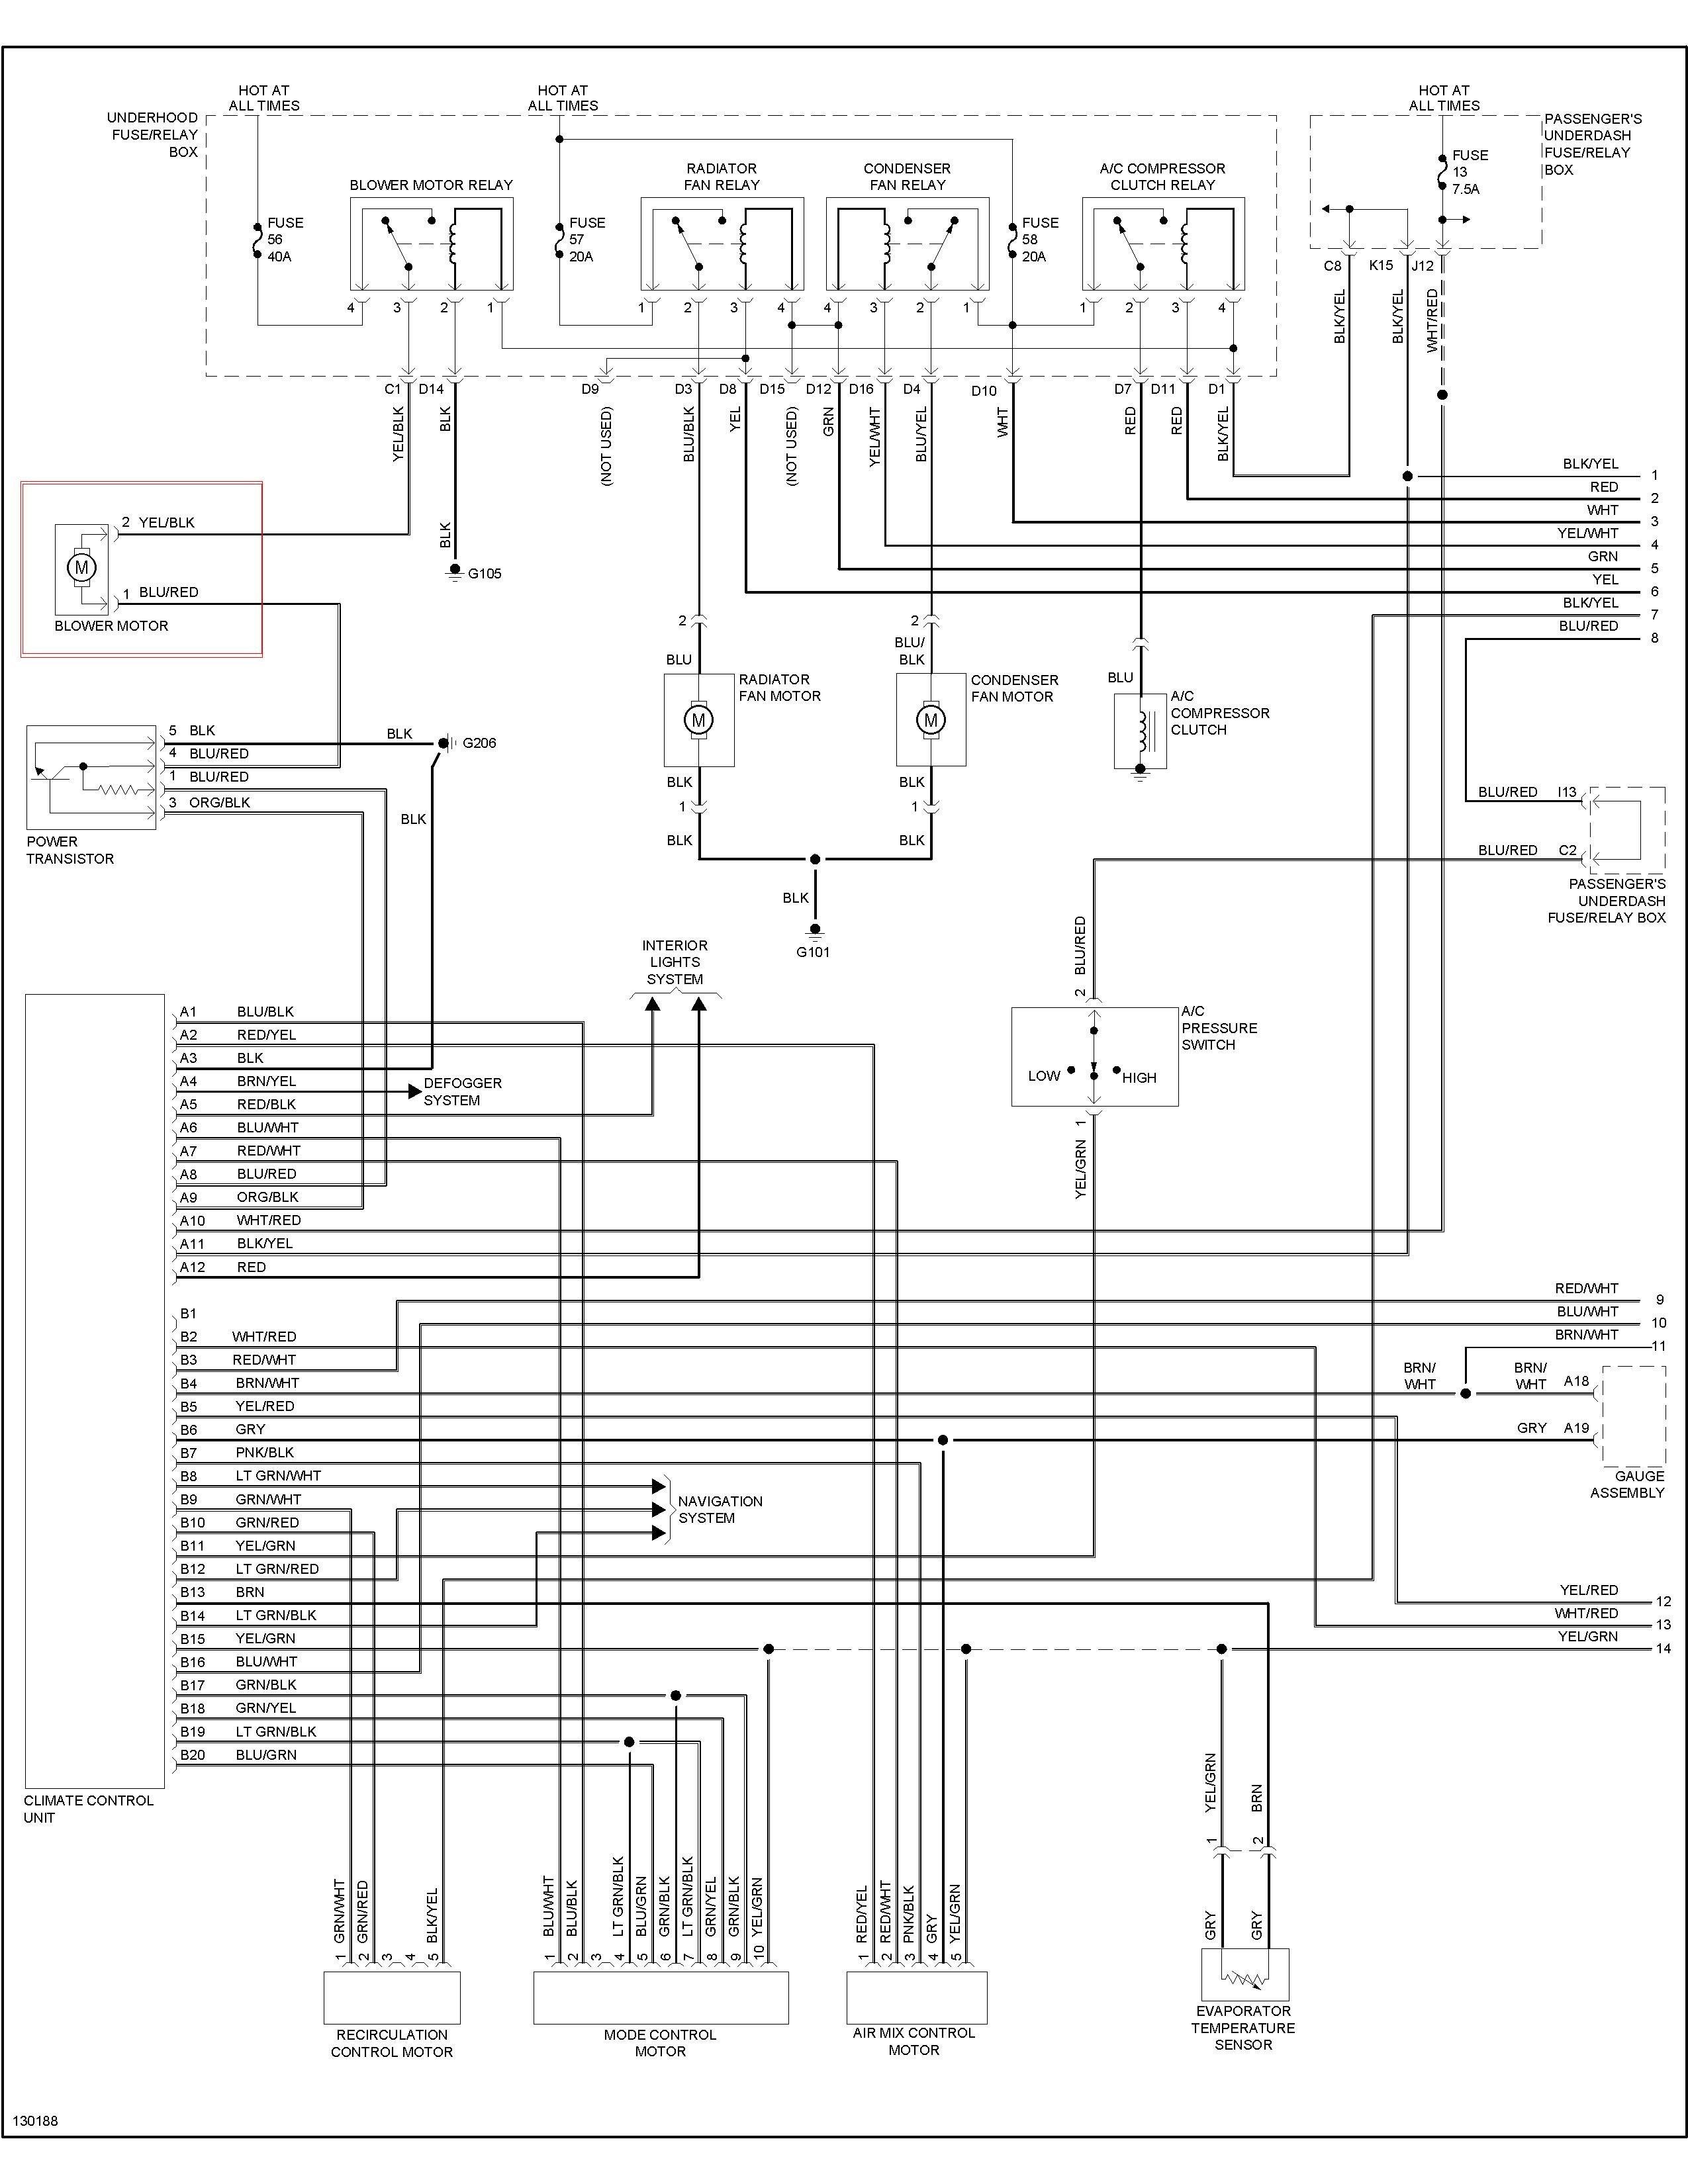 2008 Gmc 25000 Brake Lamp Diagram Diagram] 1998 Acura Wiring Diagram Full Version Hd Quality Of 2008 Gmc 25000 Brake Lamp Diagram